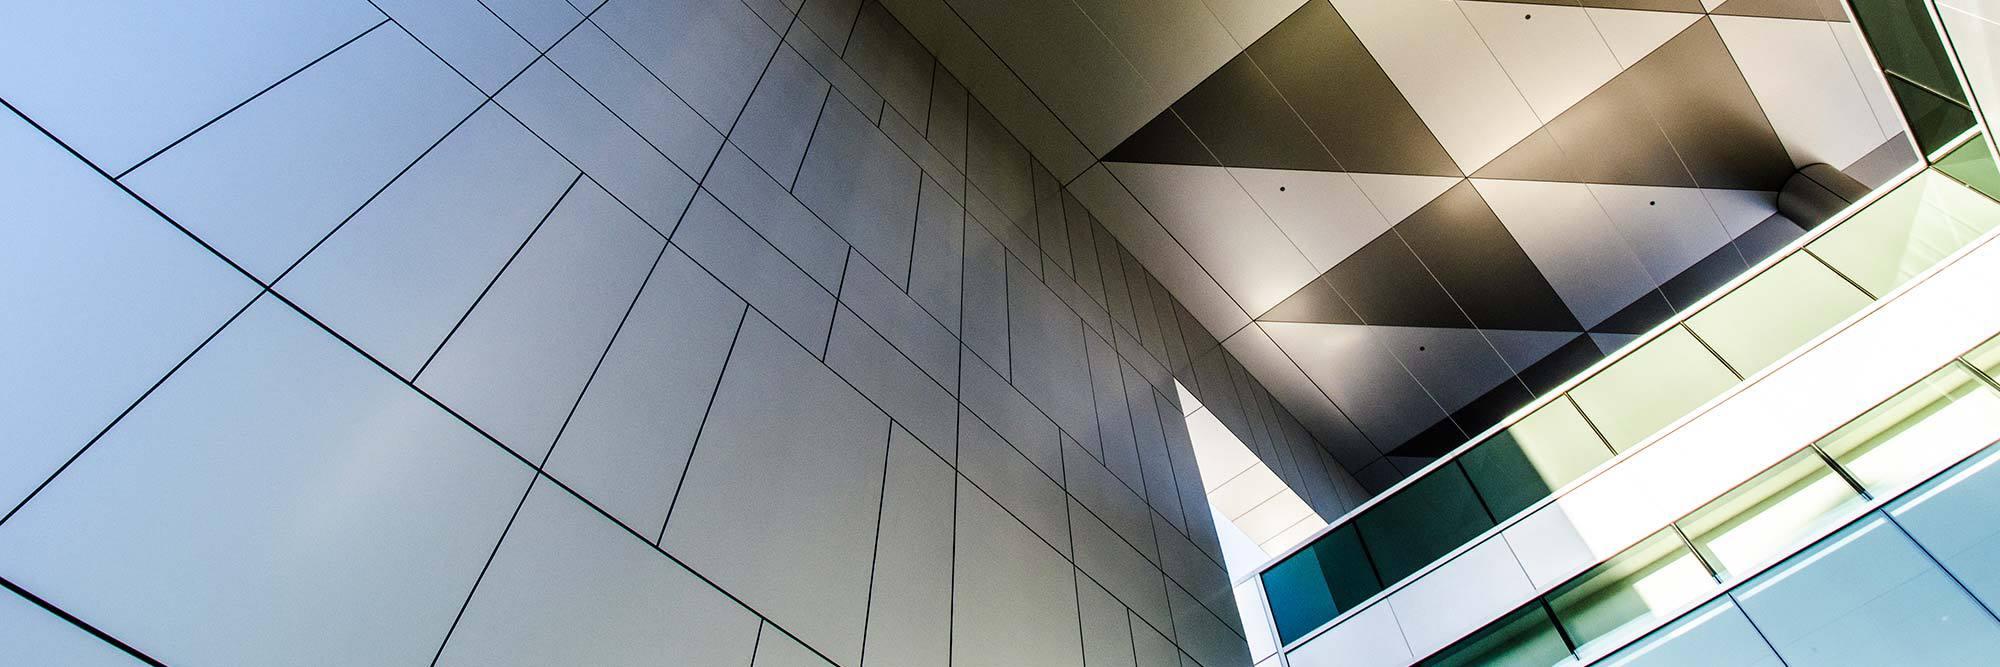 Alpolic alumawall leading edge panel systems alumawall products partners nvjuhfo Image collections